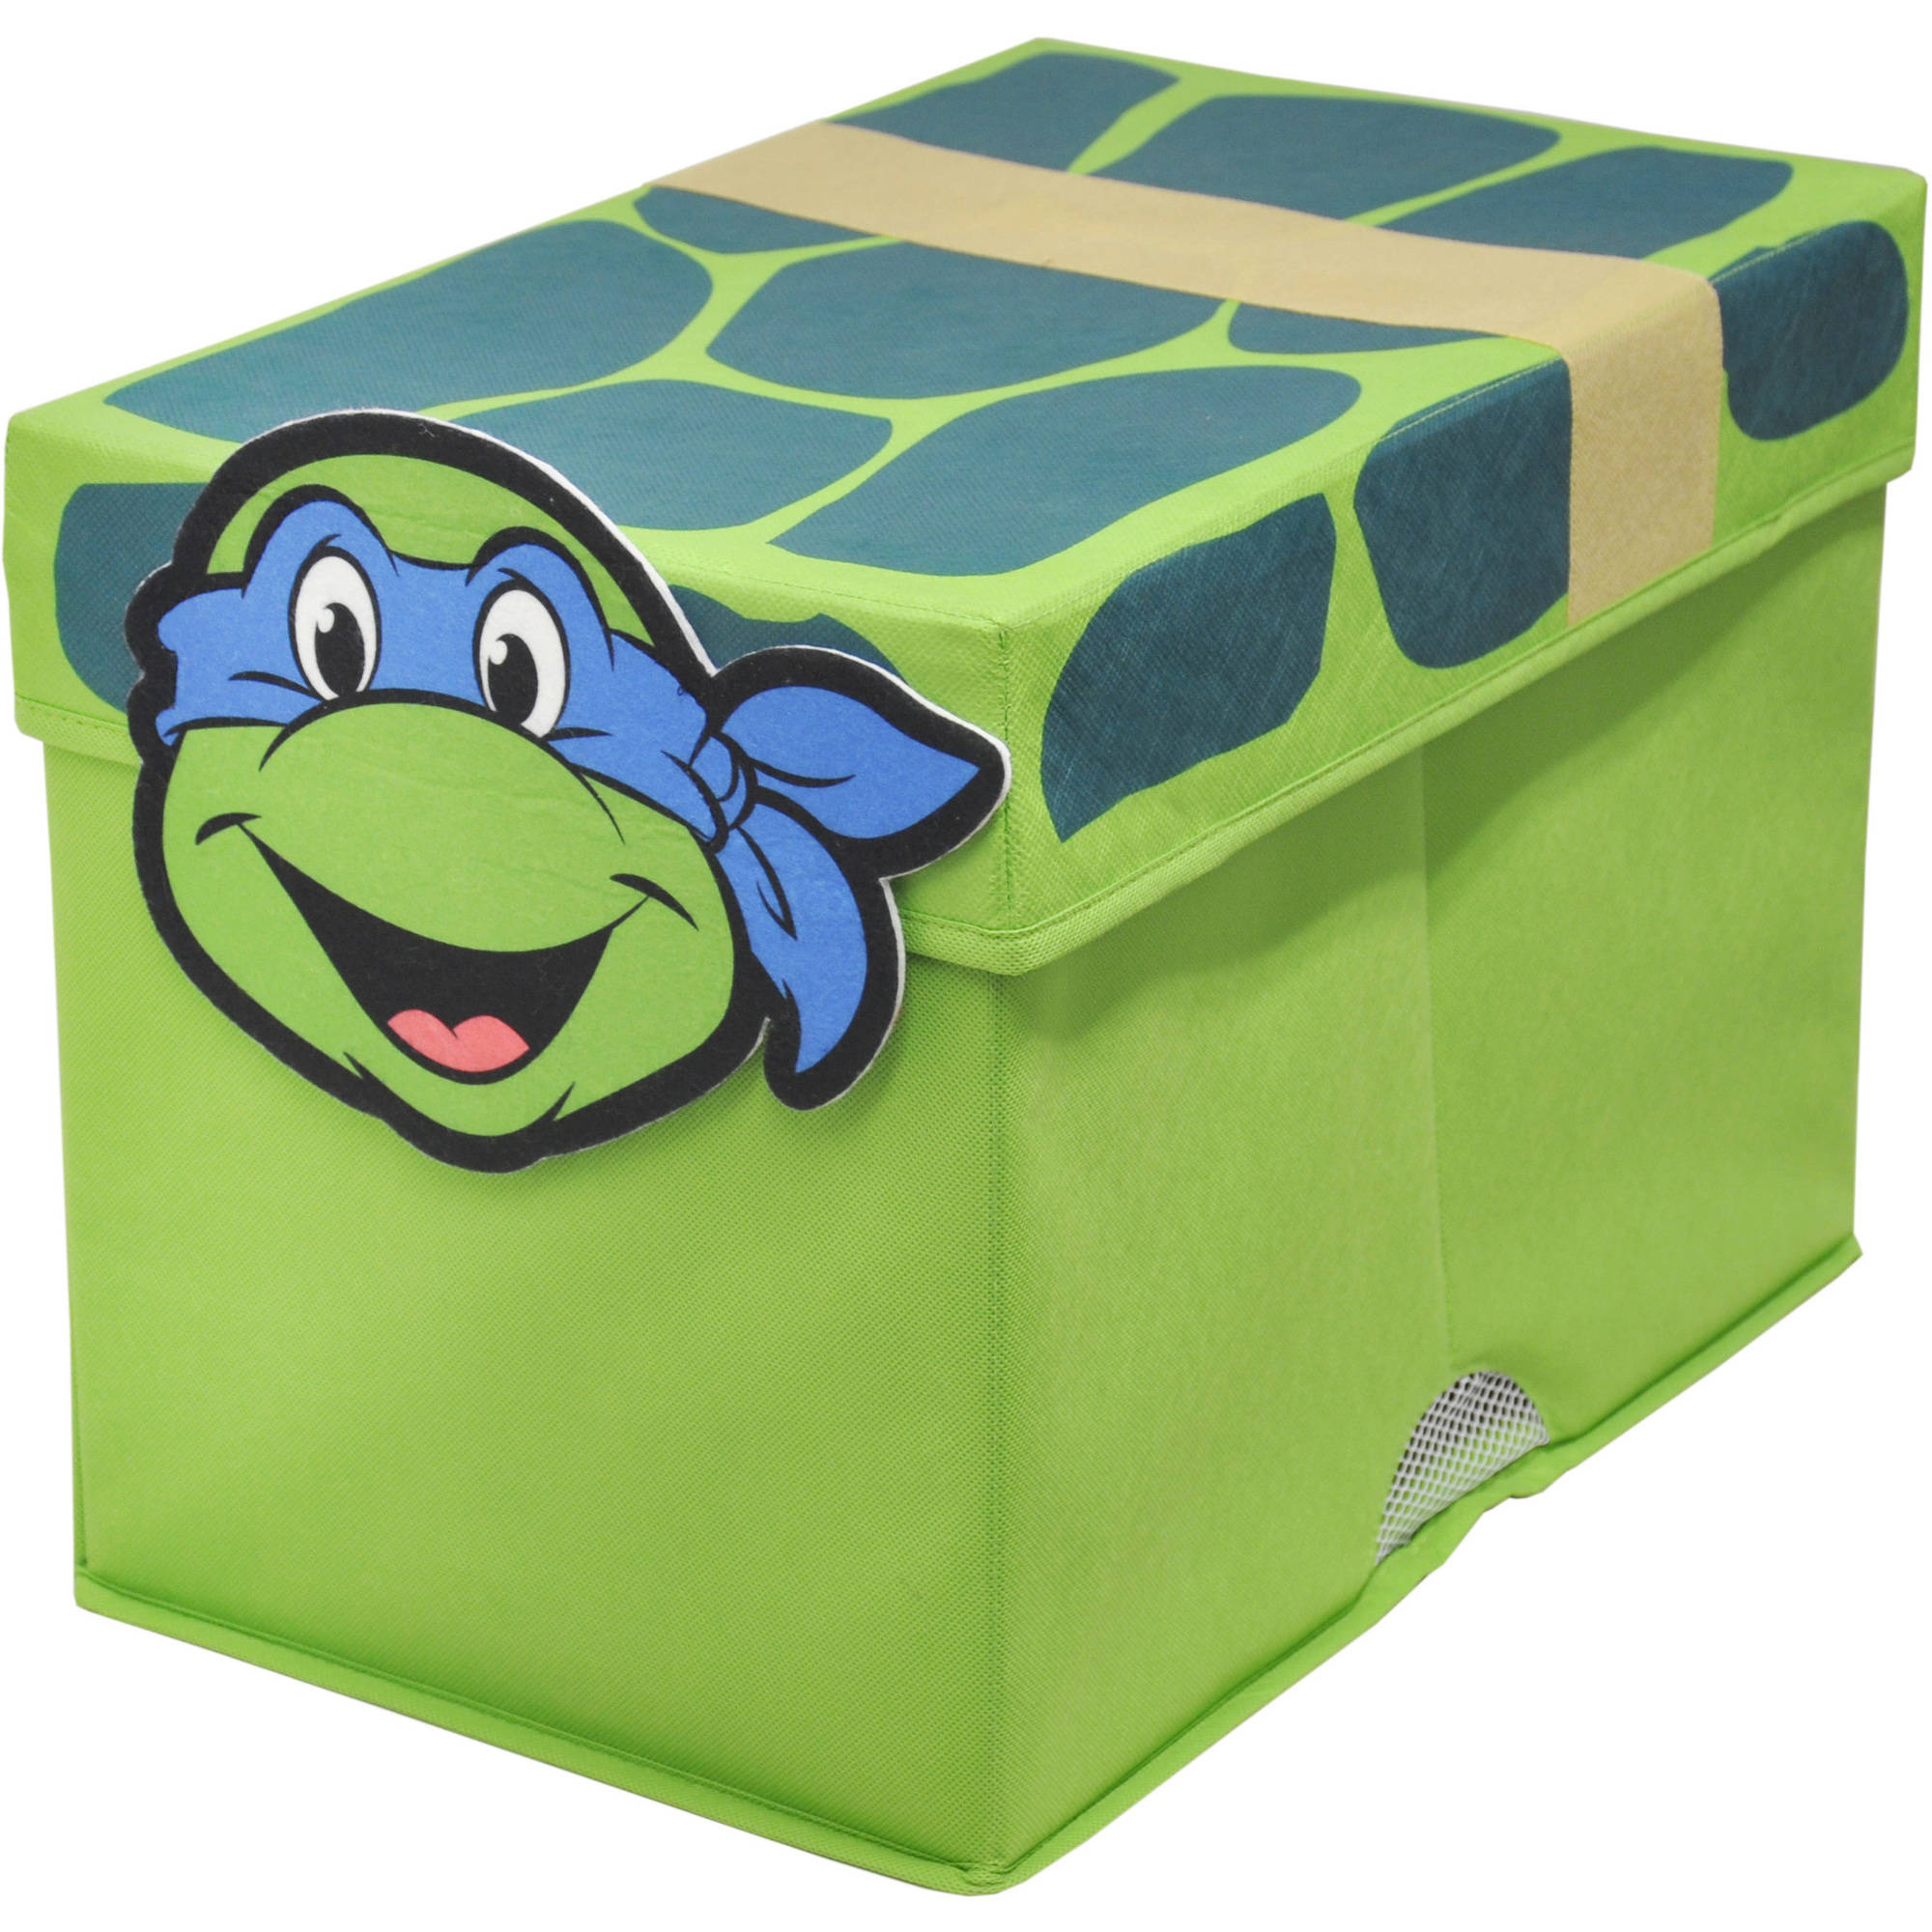 Nickelodeon Ninja Turtles Figural Toy Box